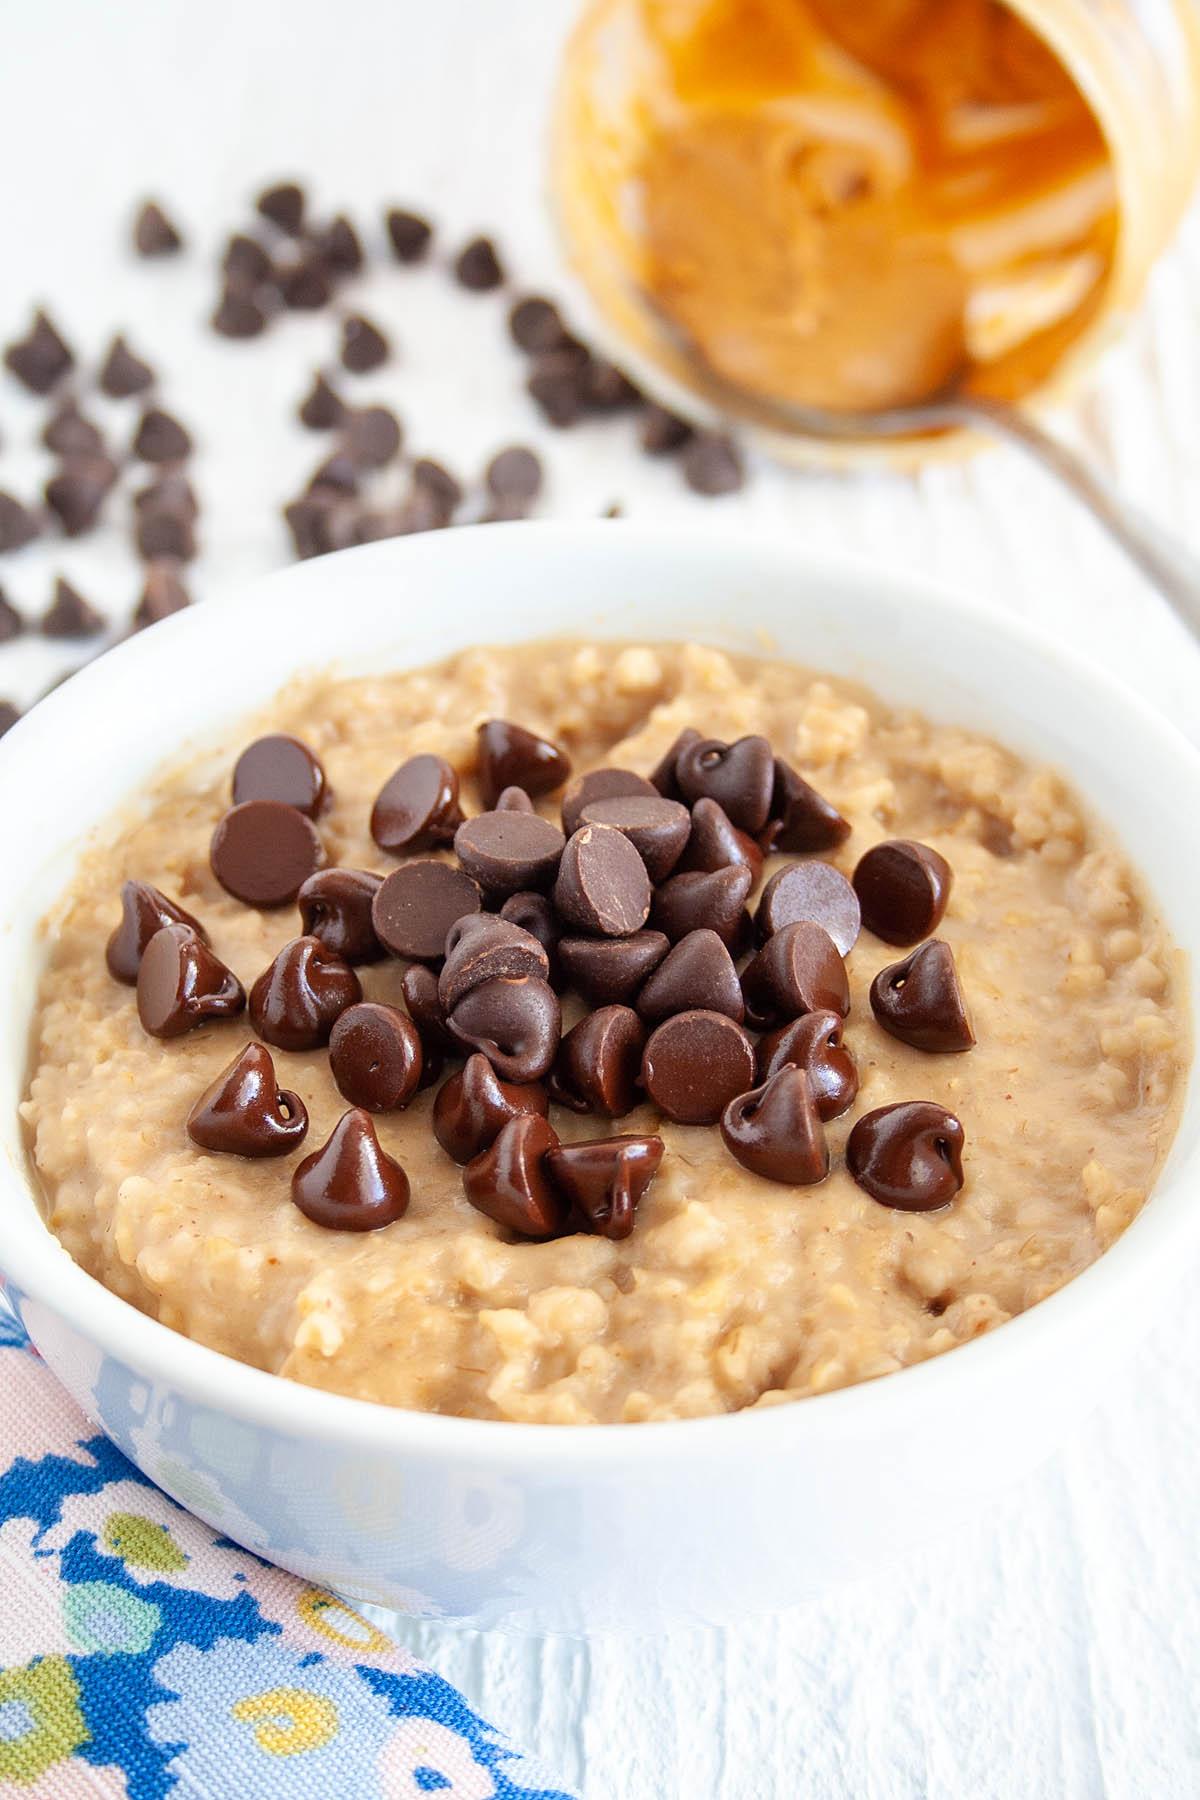 Peanut Butter Chocolate Chip Steel Cut Oats with peanut butter and chocolate chips in the background.